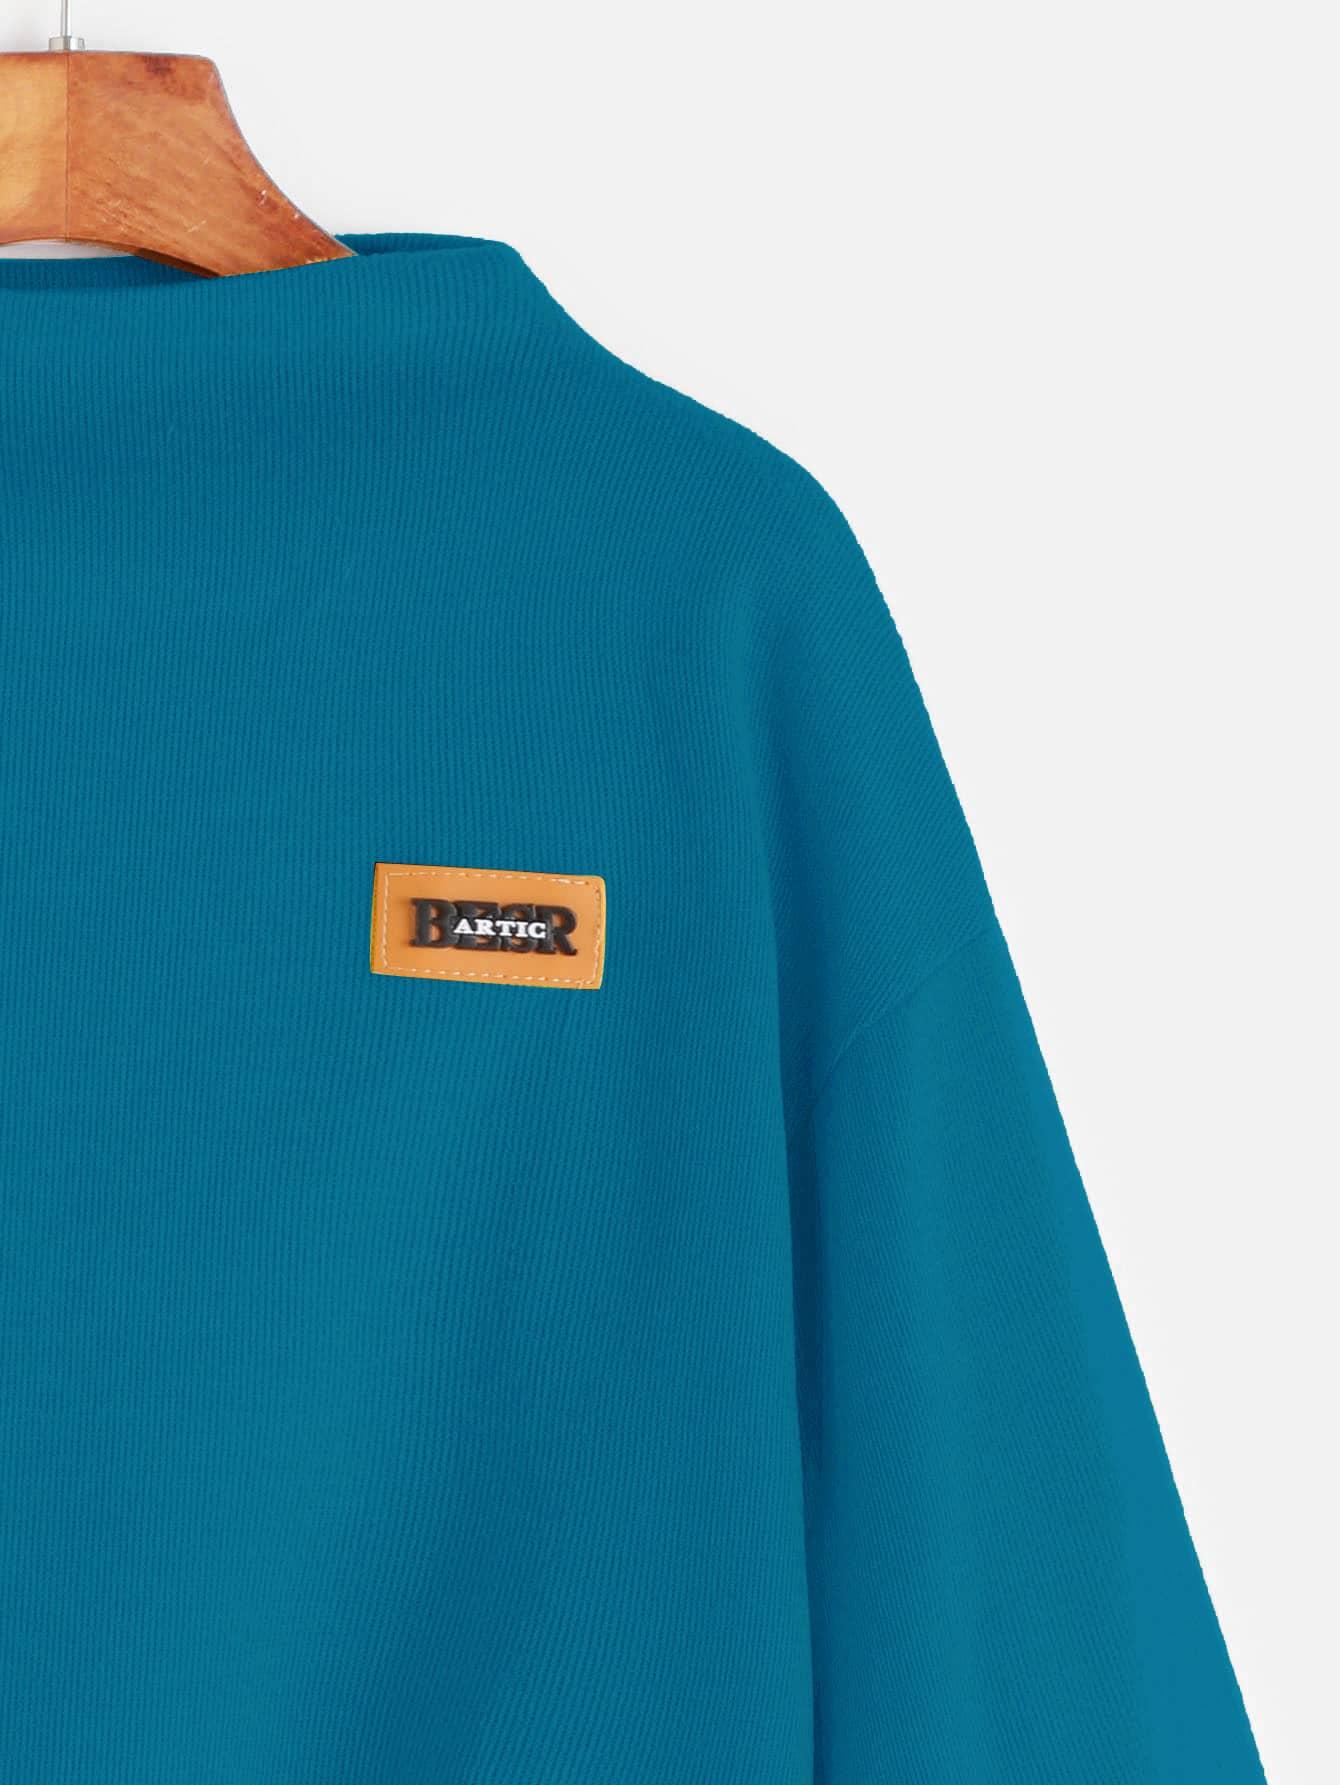 Bishop Sleeve Patch Sweatshirt